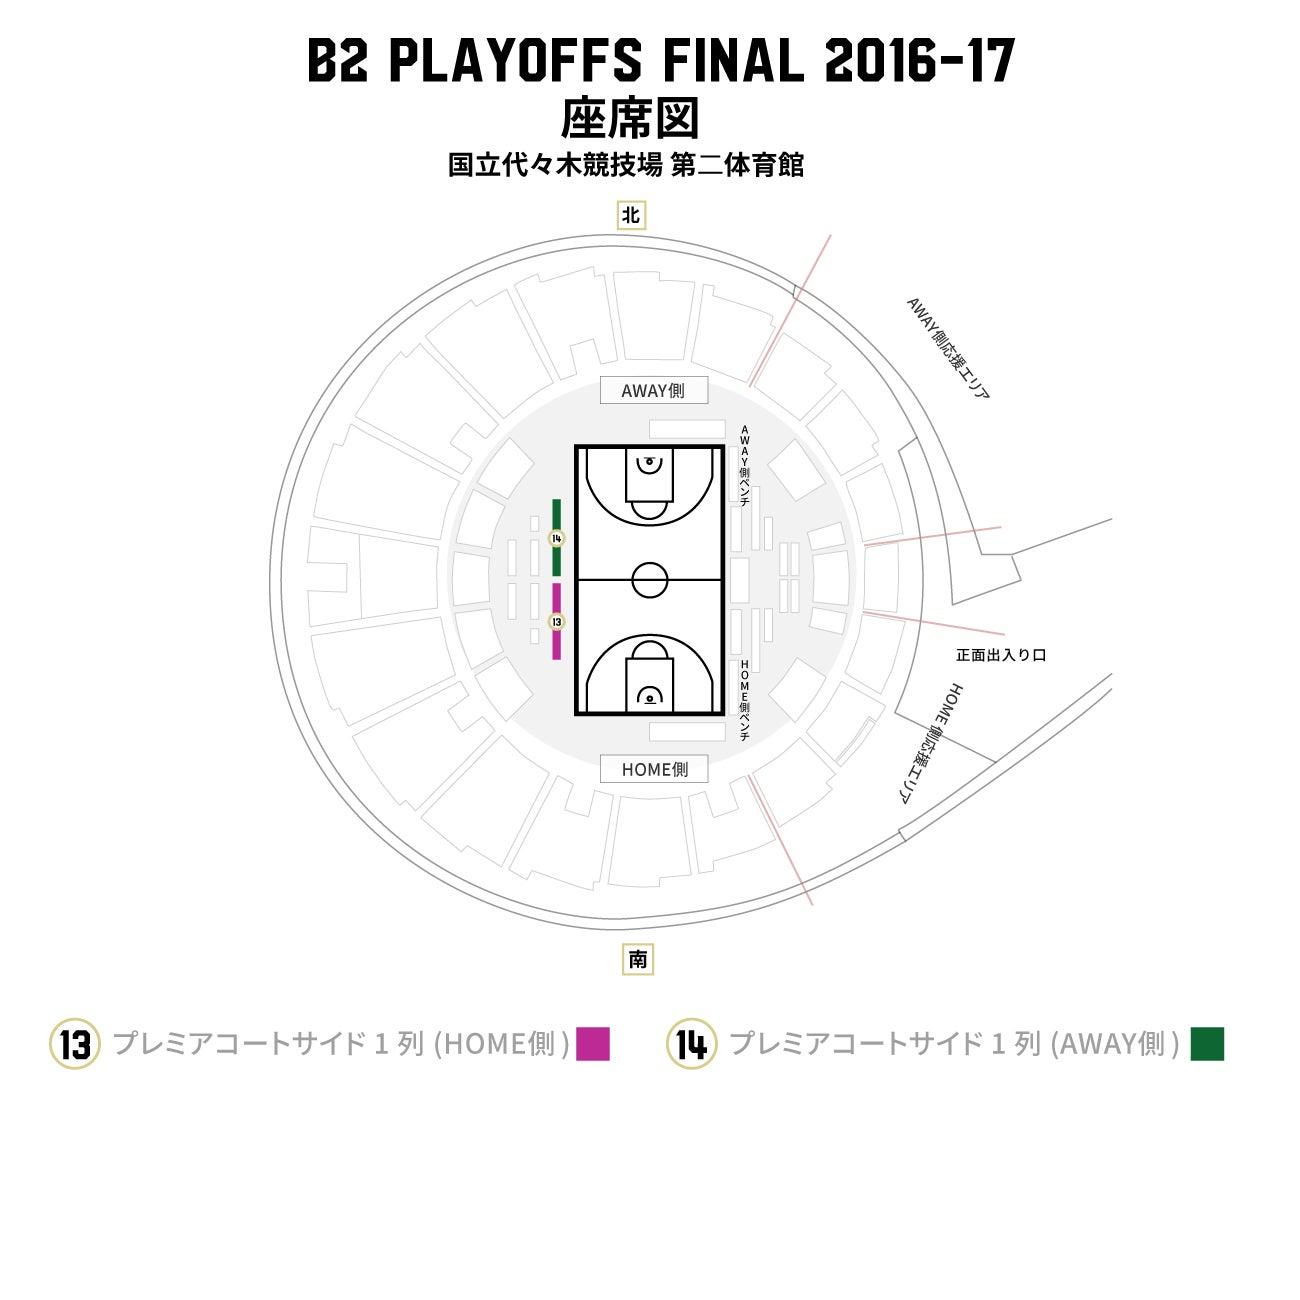 seatview_b2final_seat_13_14.jpg